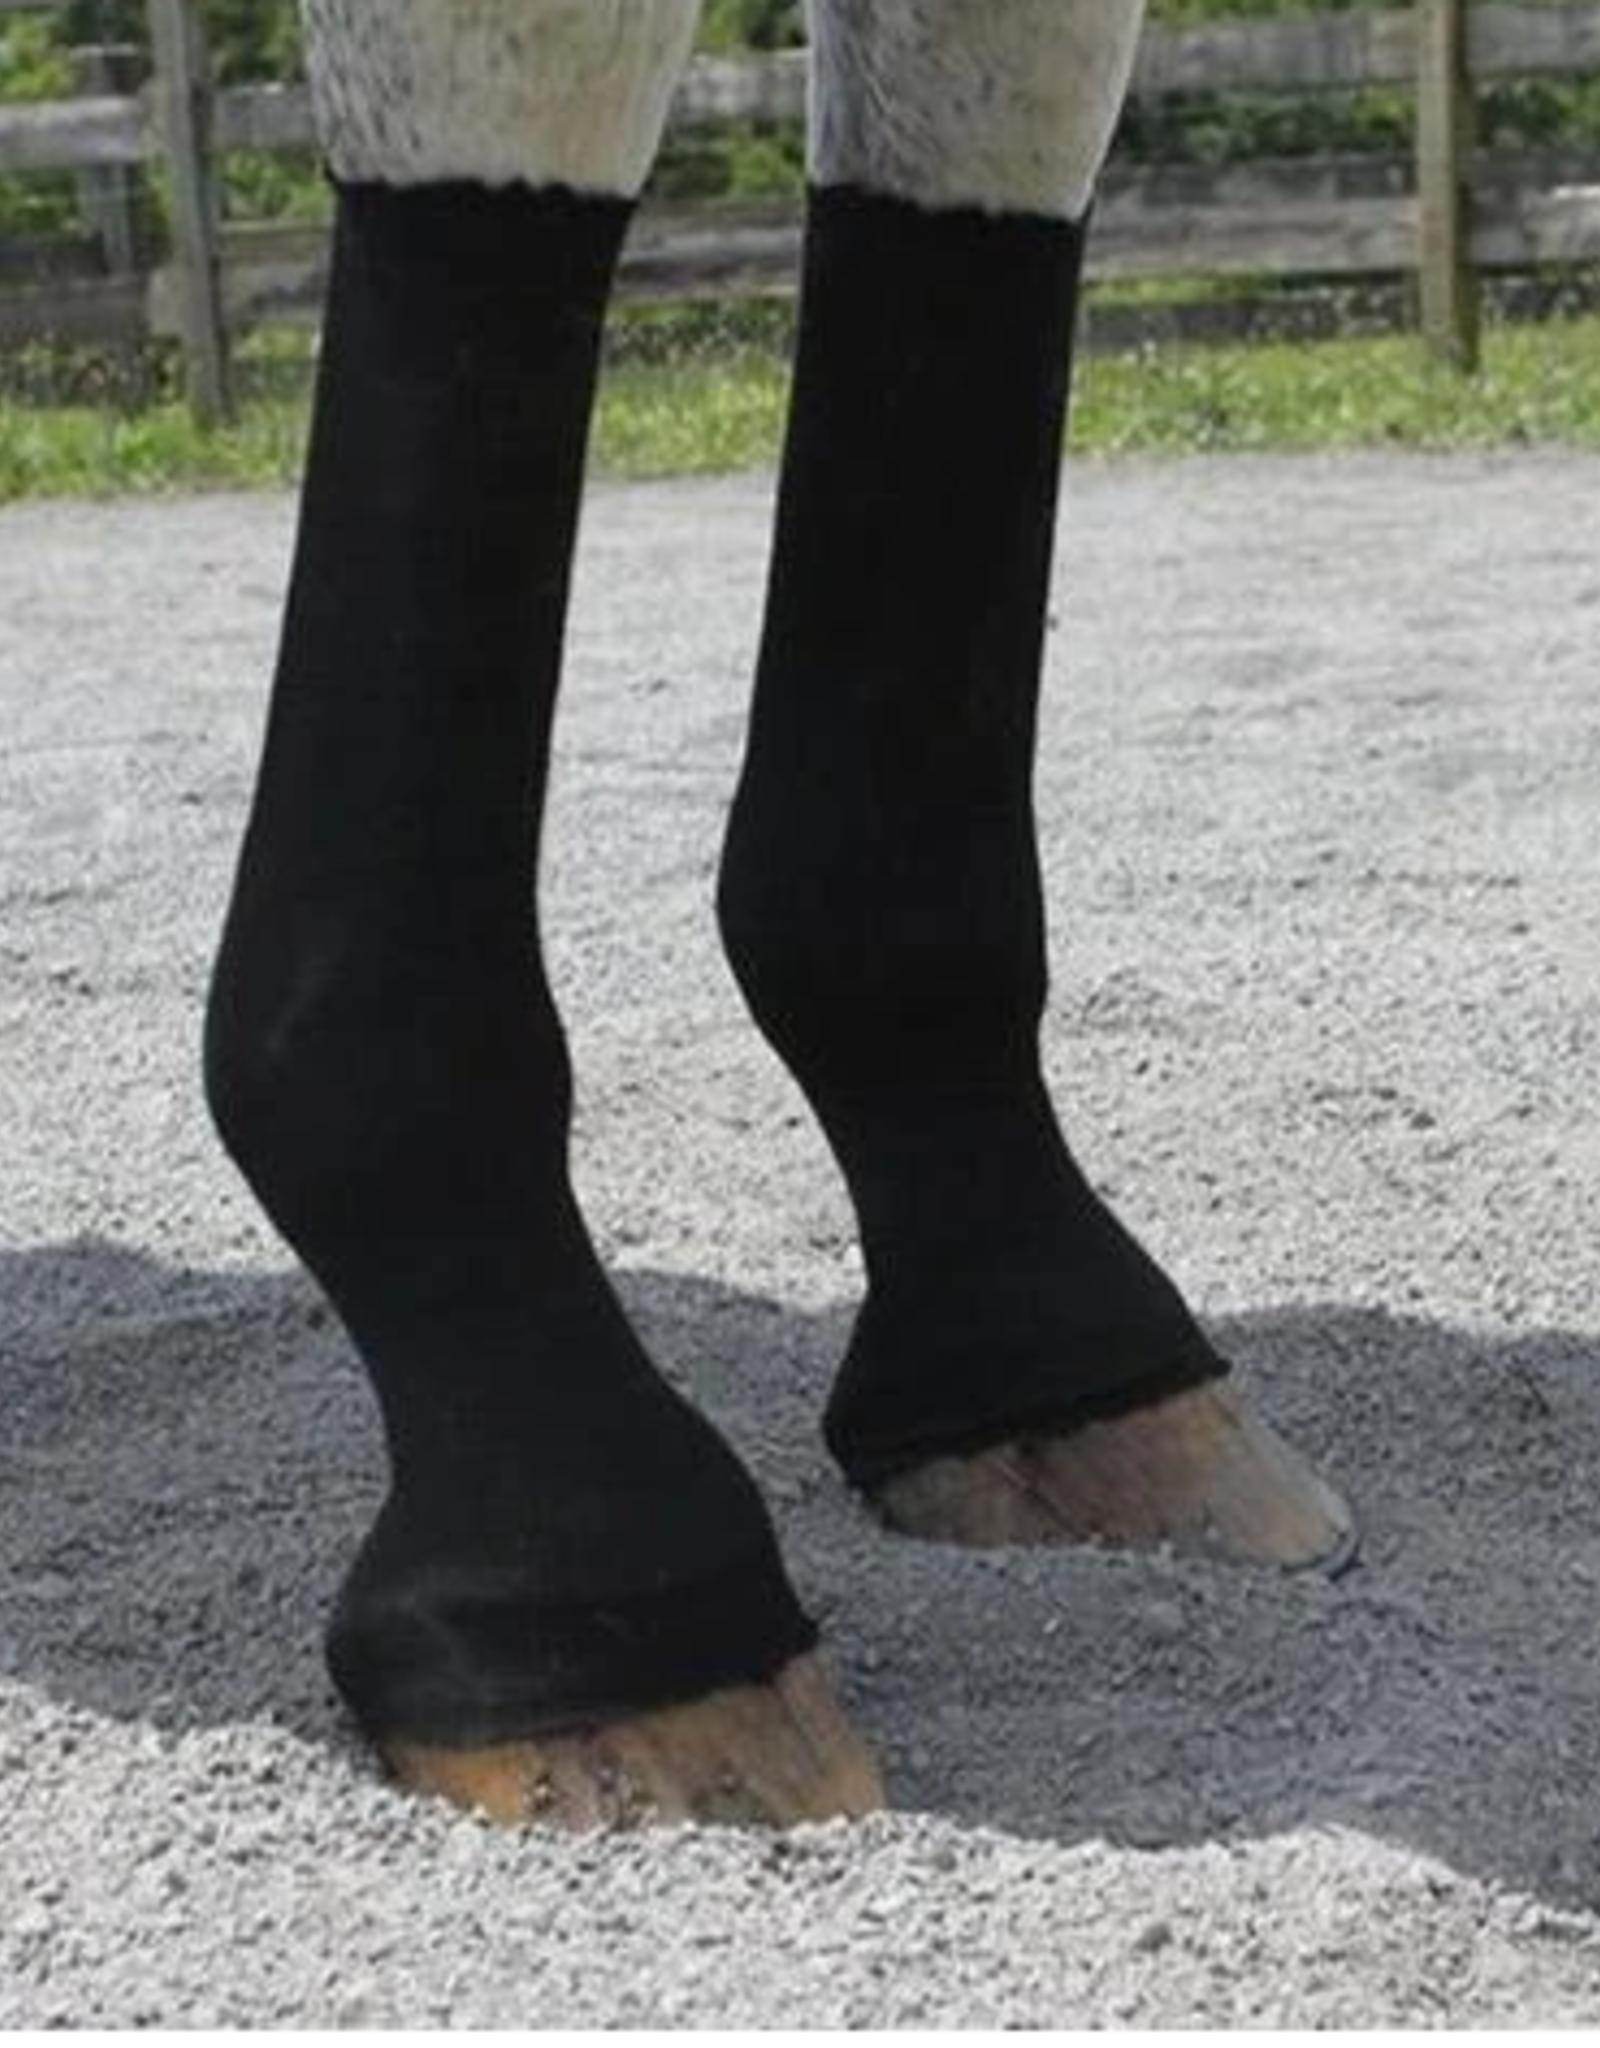 EquiFit HorseSox - Pair